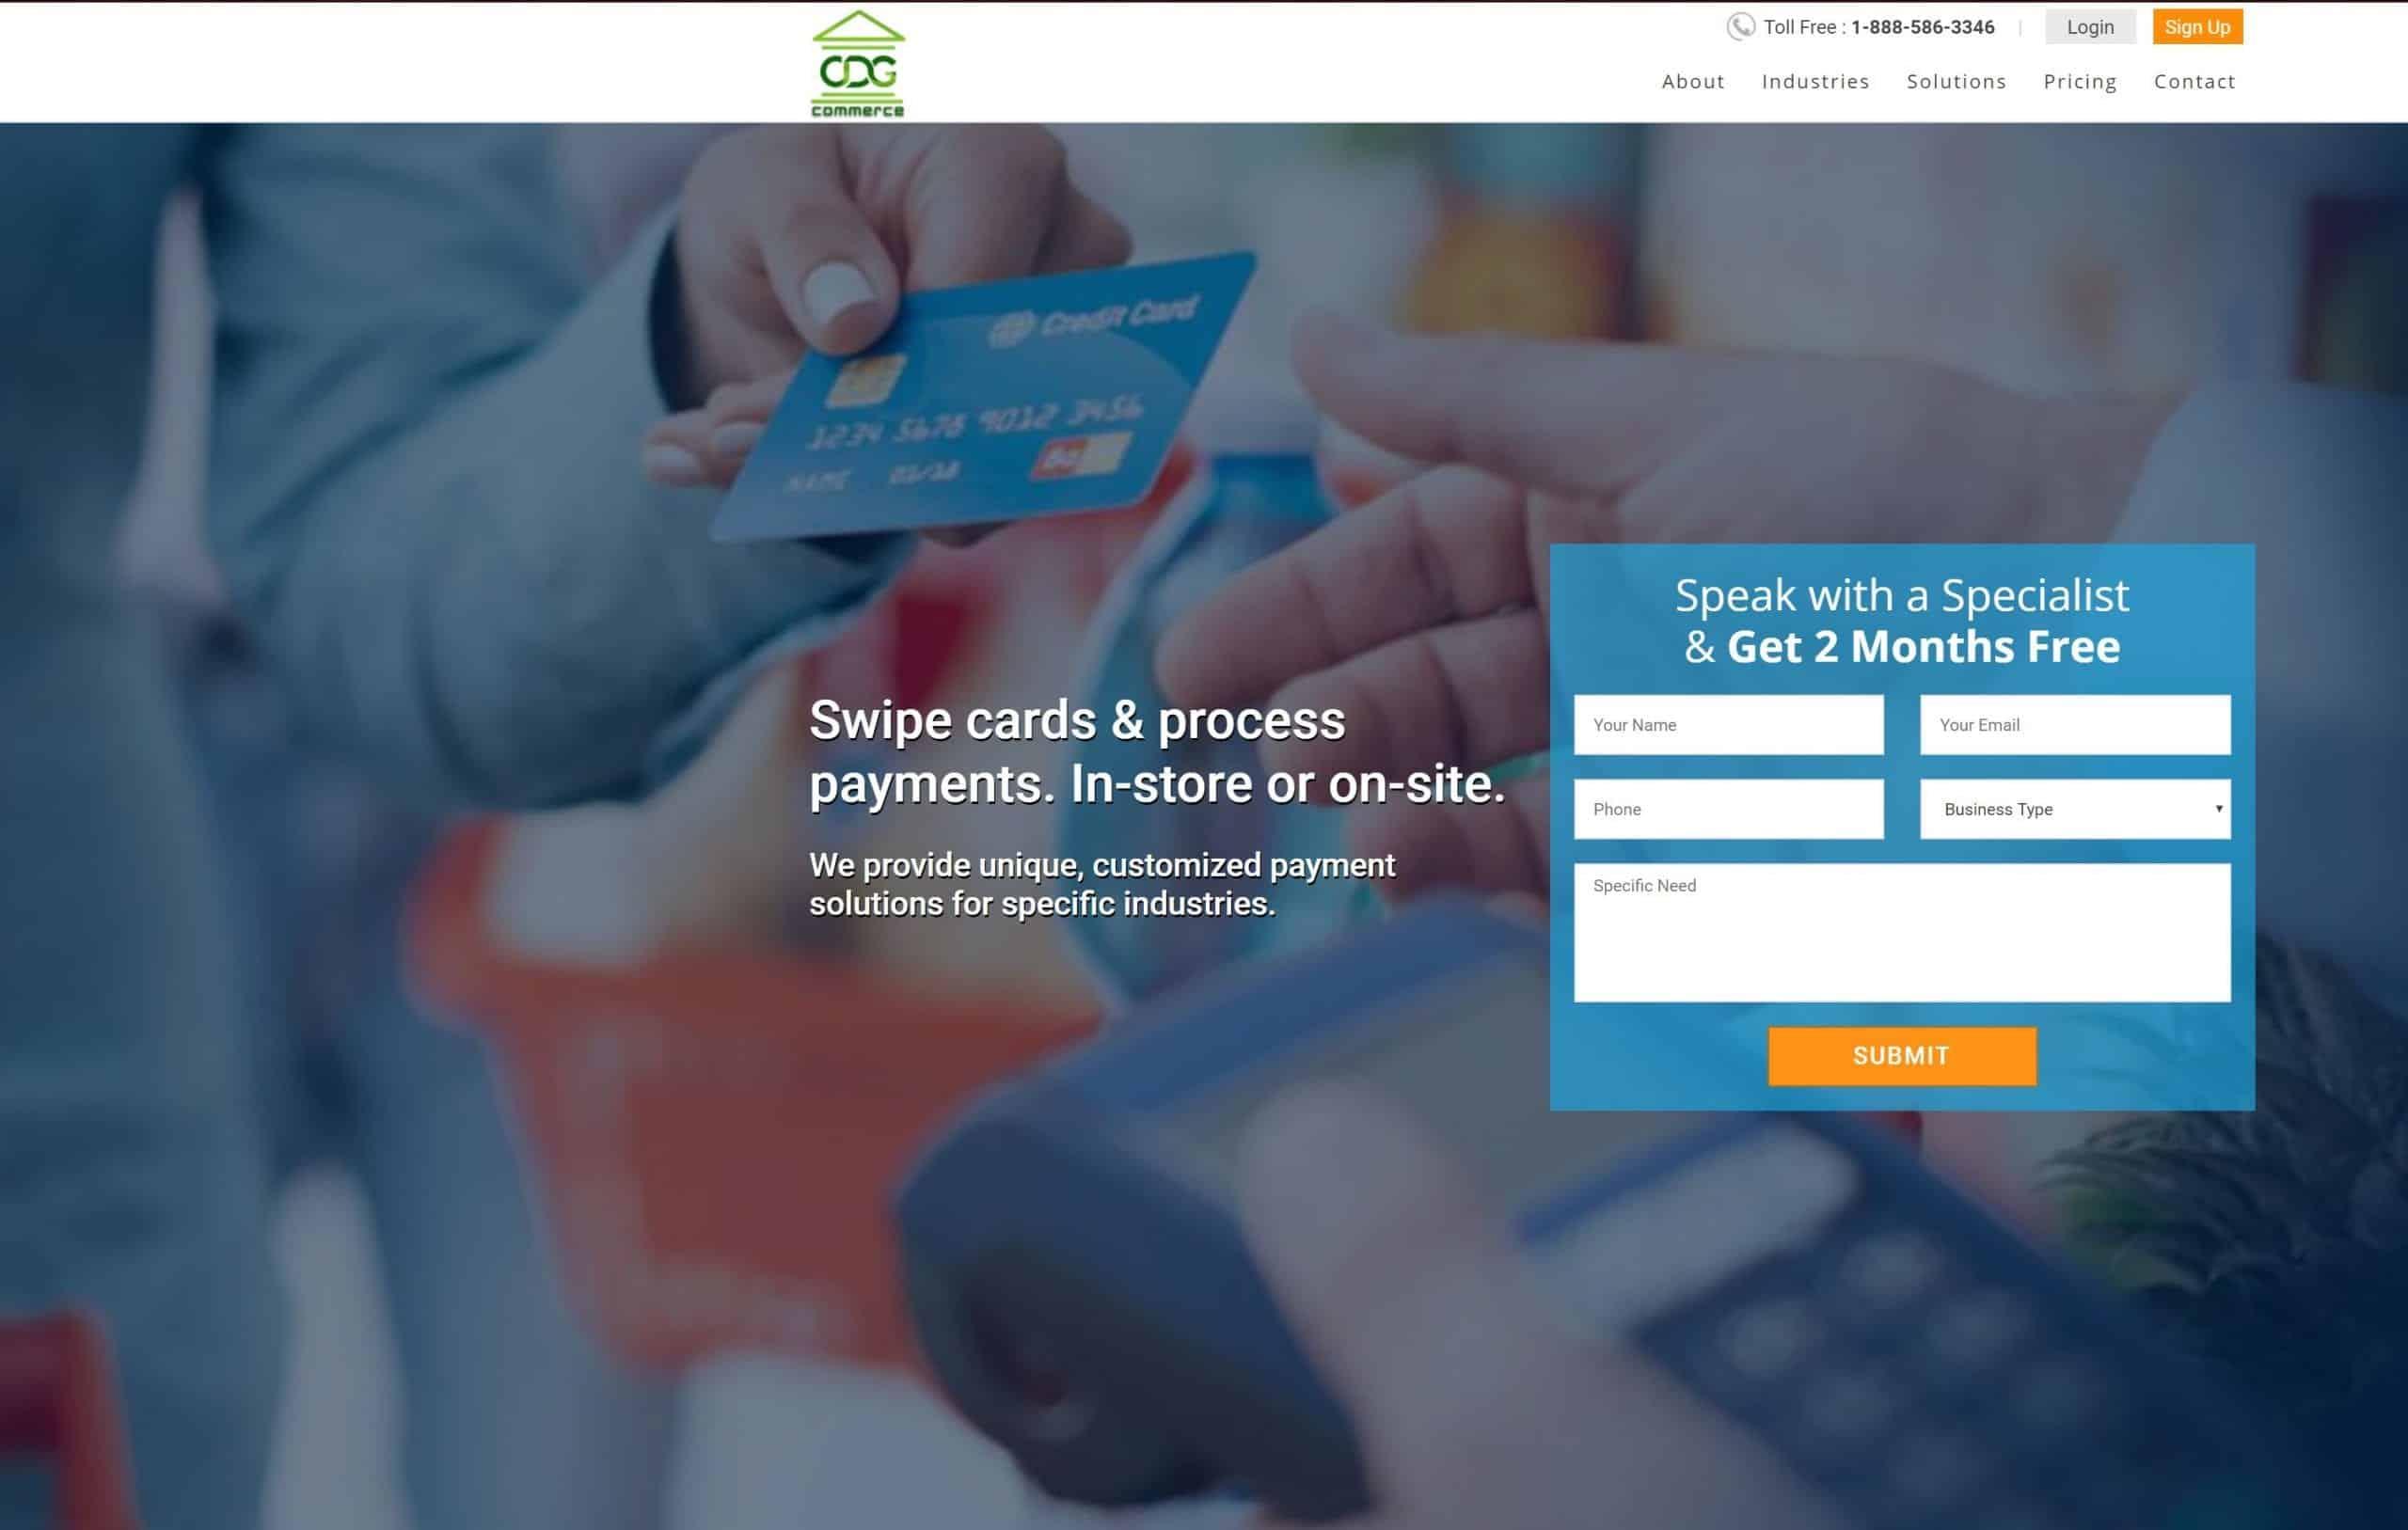 CDGCommerce screenshot (new logo)